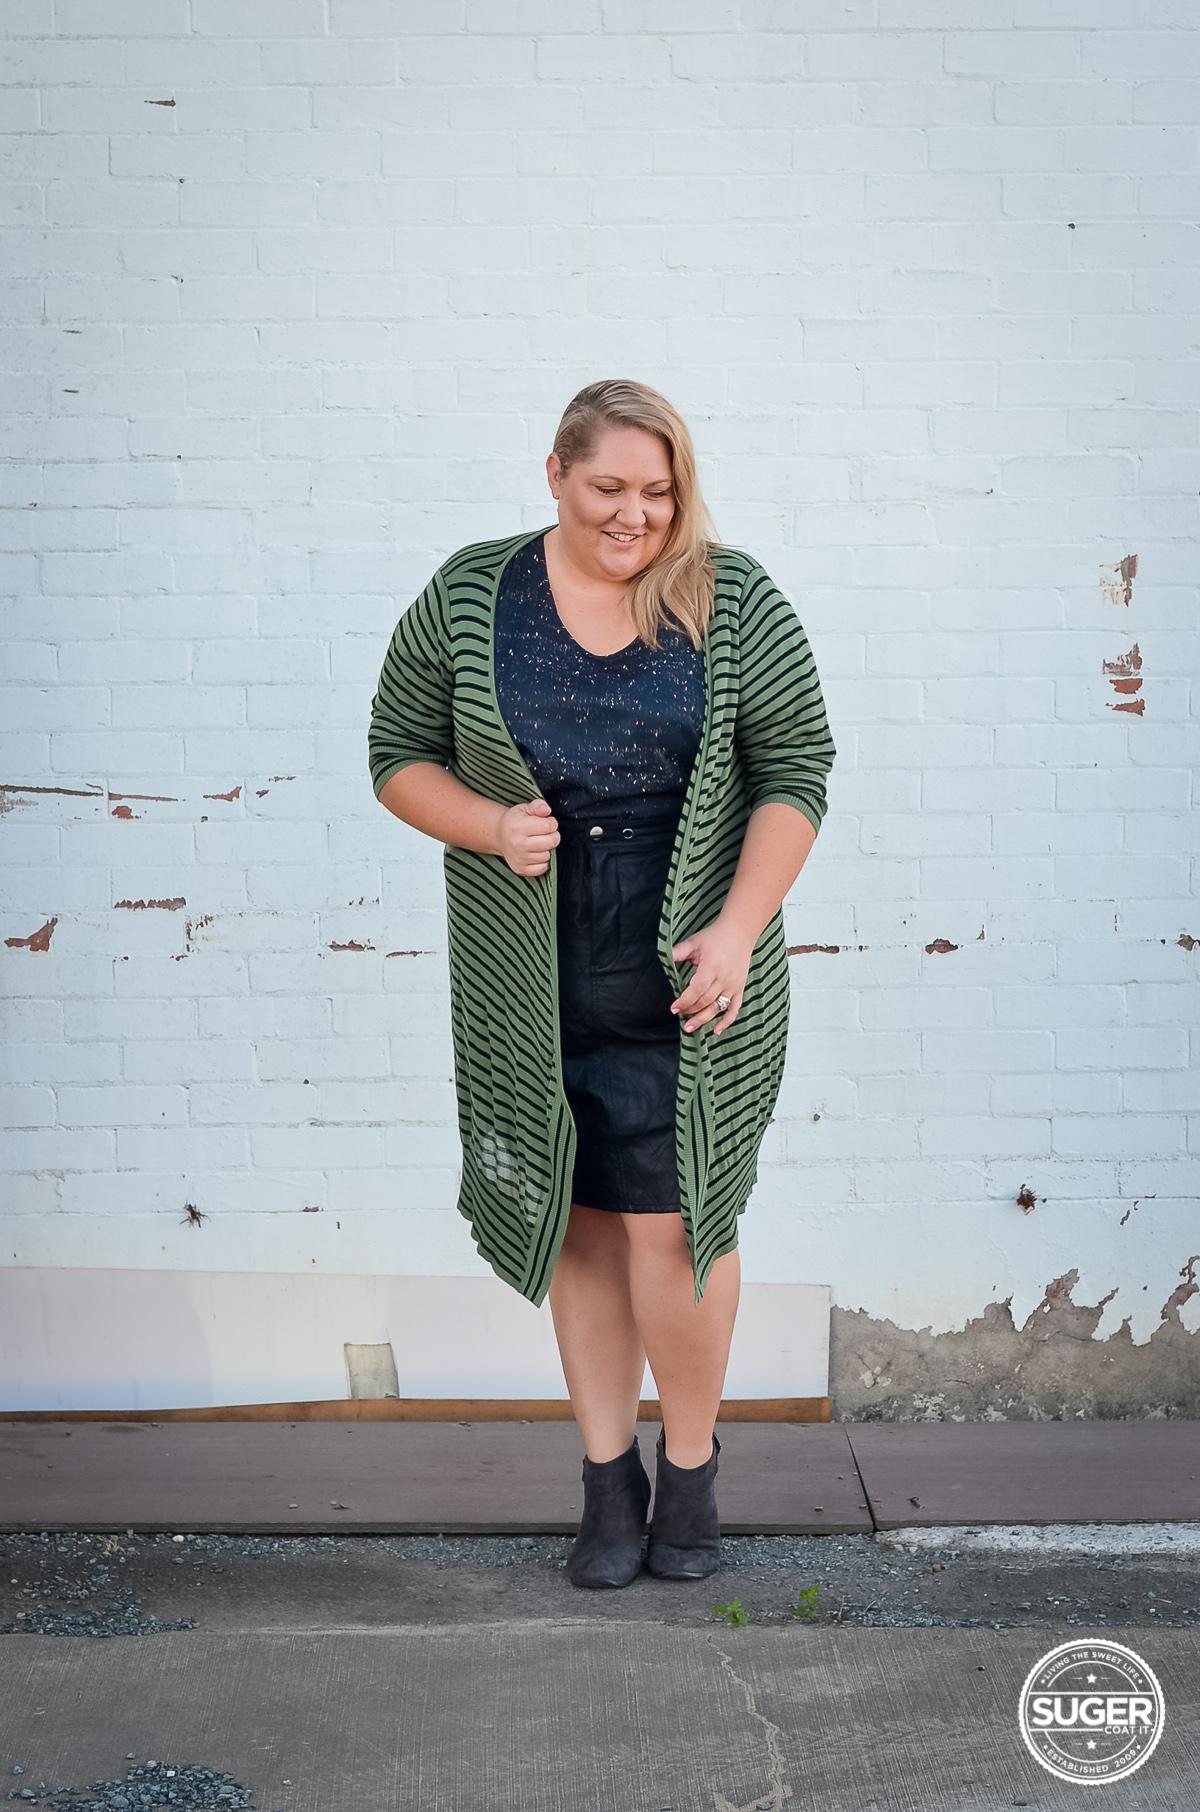 plus size blogger australia 17 sundays aw16 outfit-4